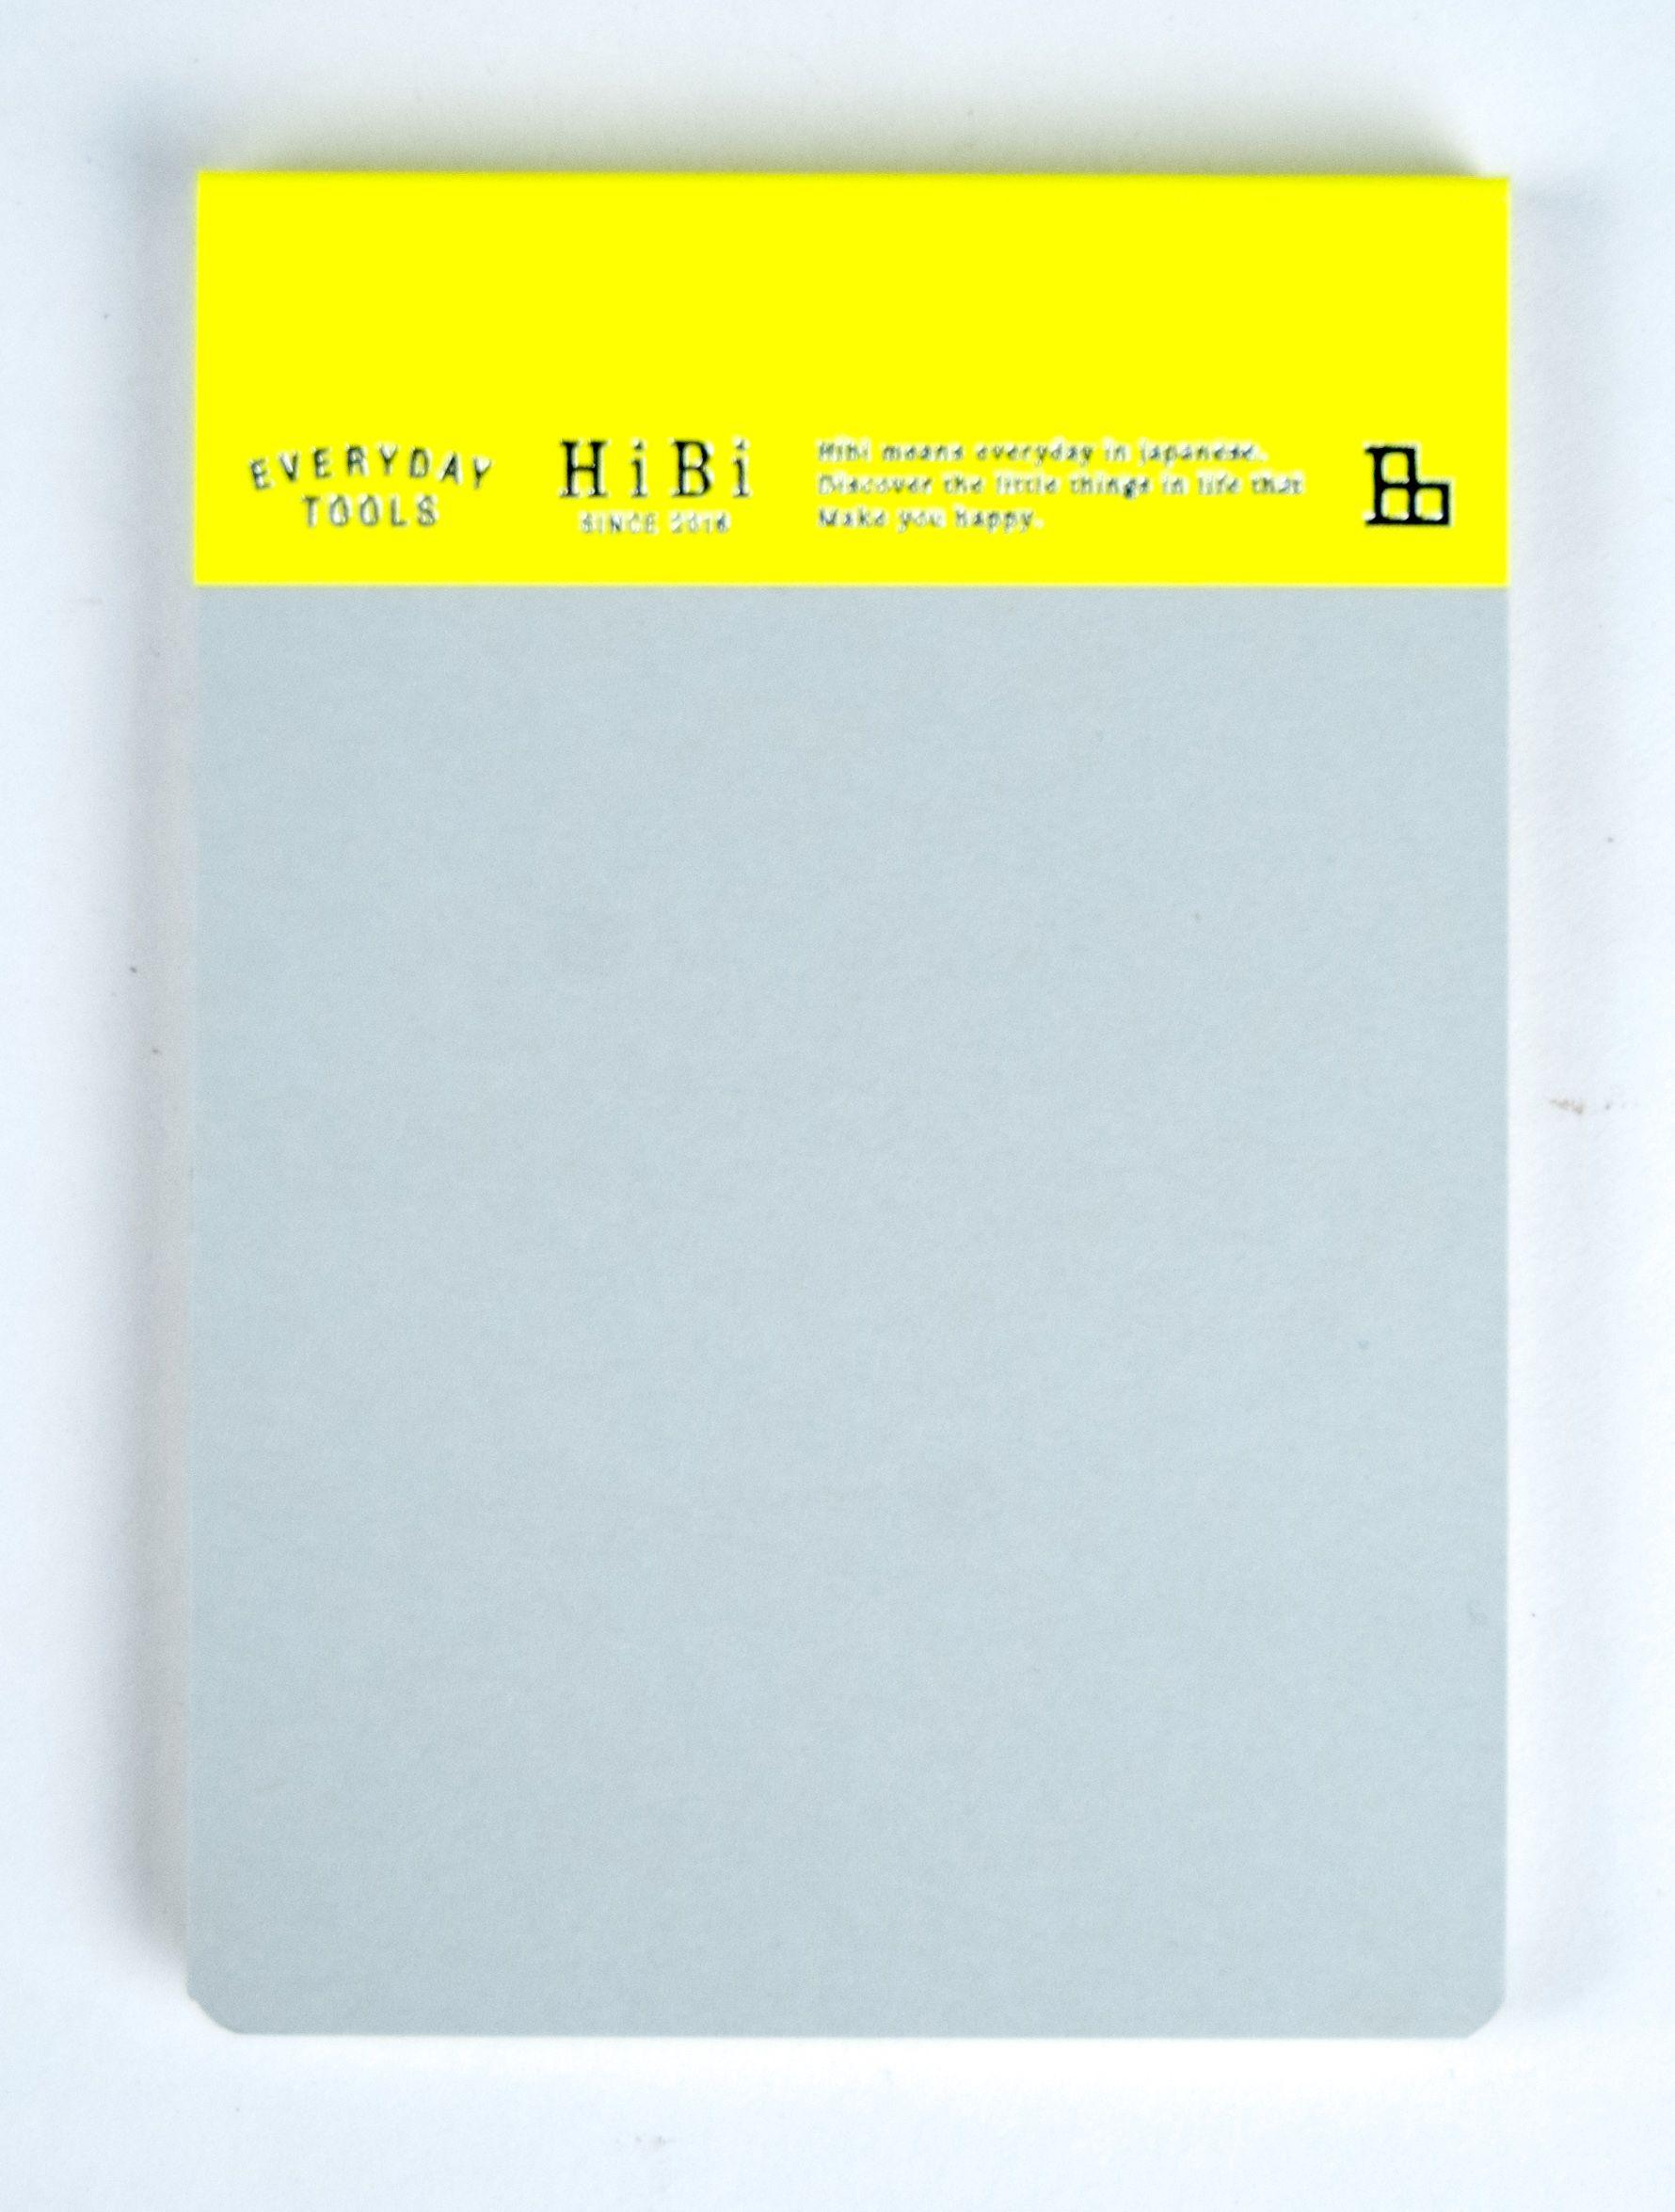 hibi yellow memo pad inspired by s leading design trends hibi yellow memo pad inspired by s leading design trends hibi means